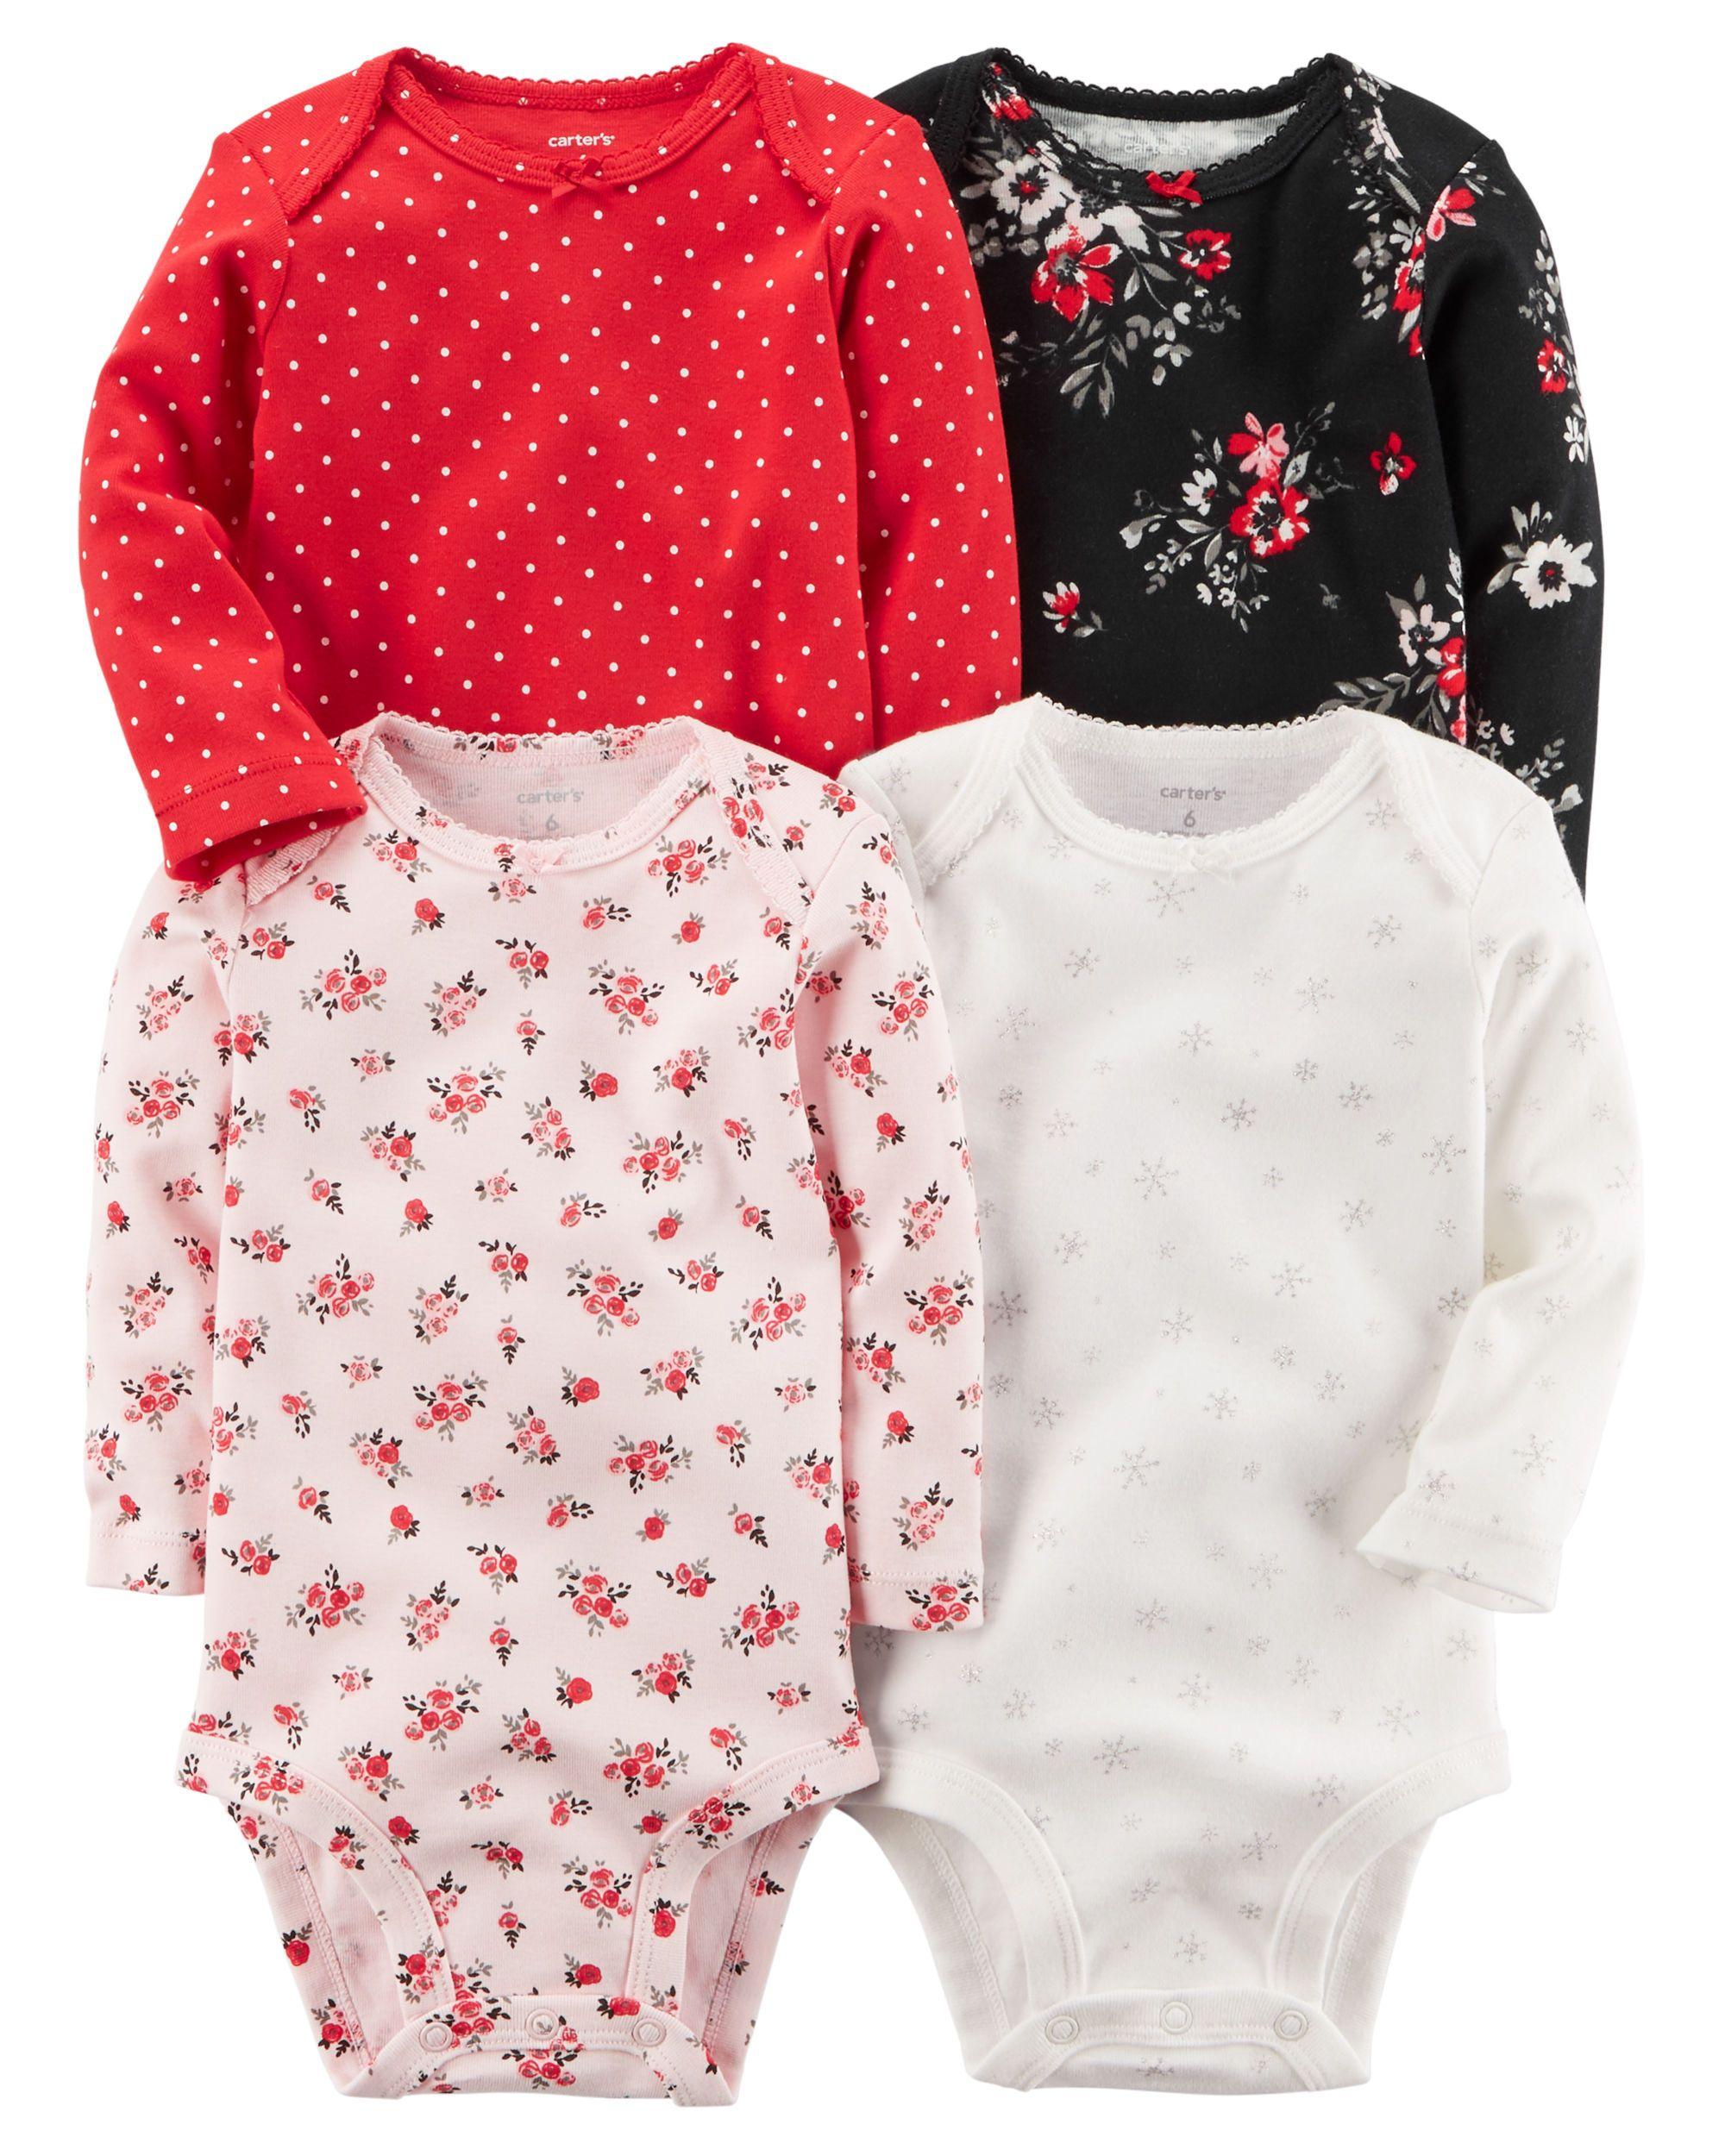 4 Pack Long Sleeve Original Bodysuits